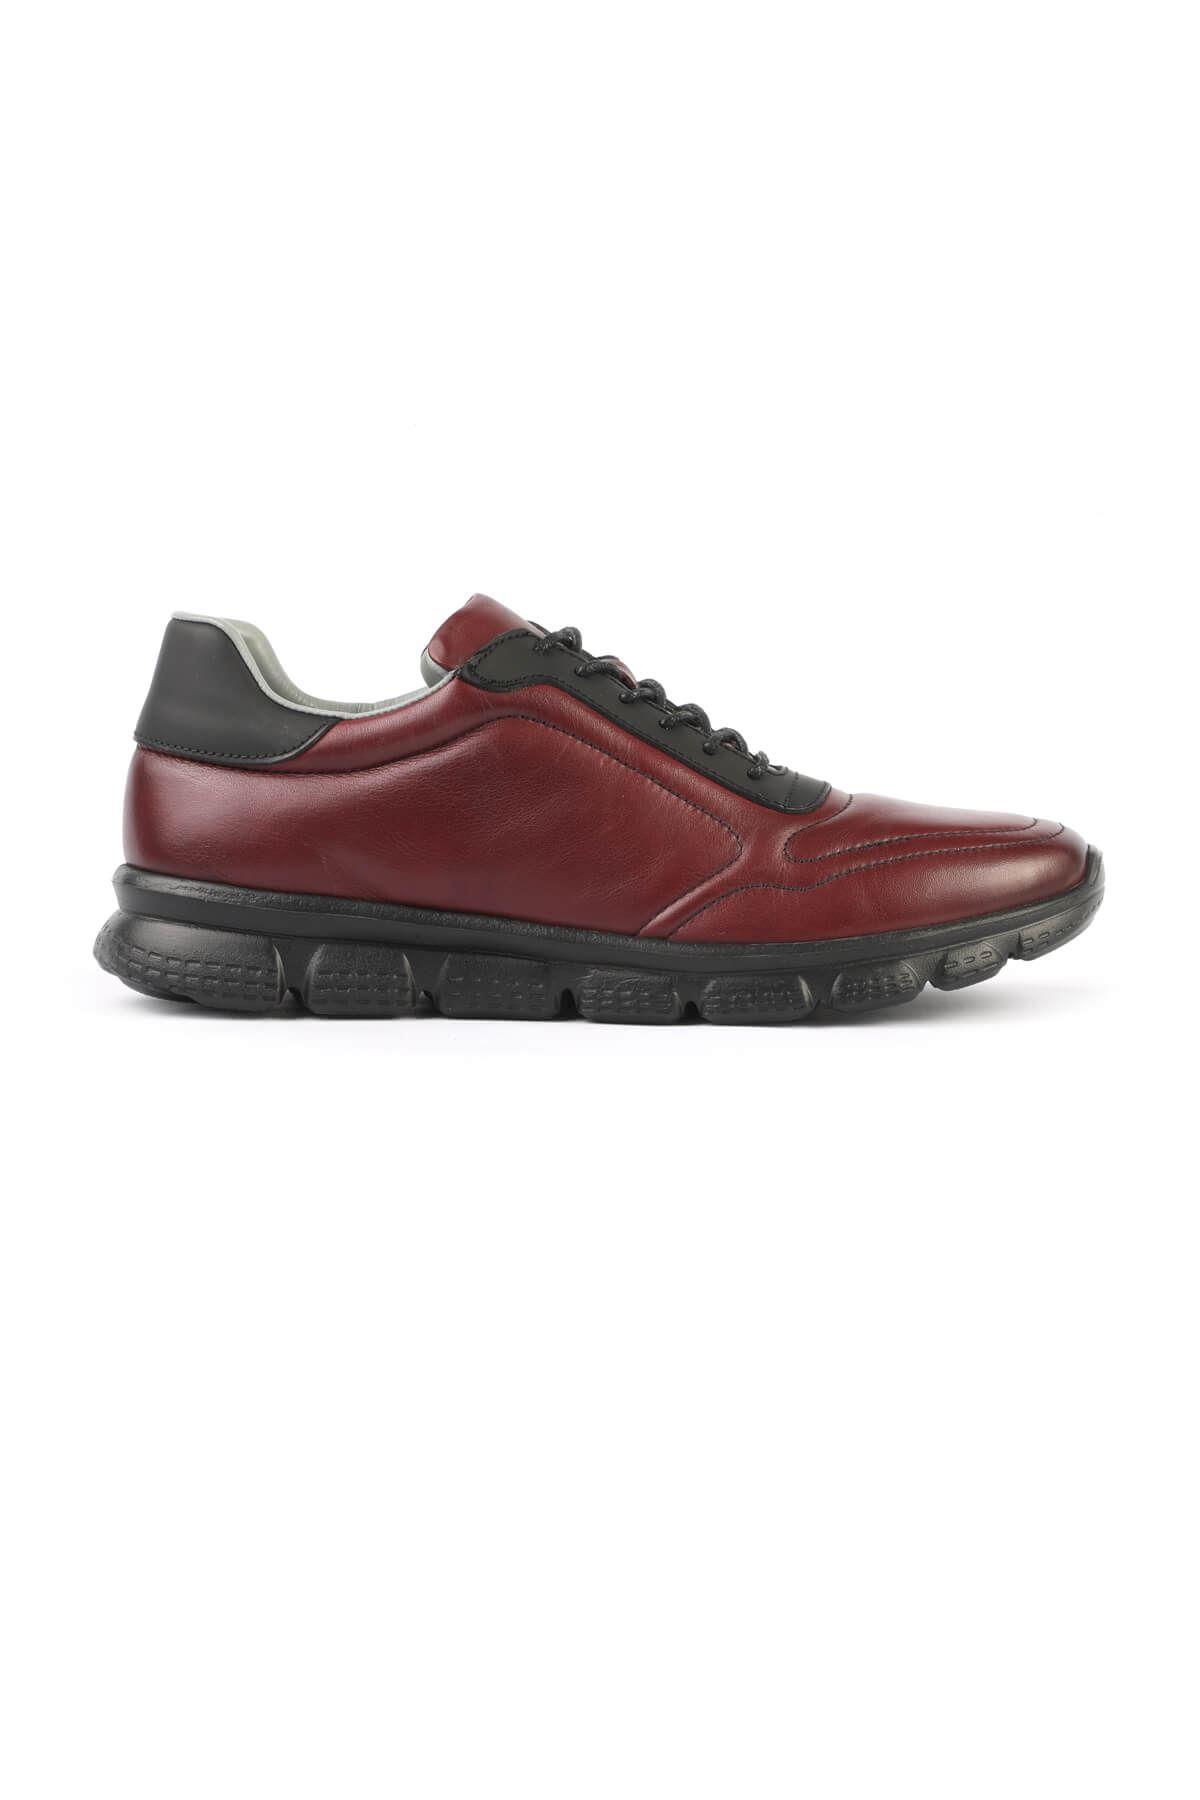 Libero 3121 Claret Red Sport Shoes